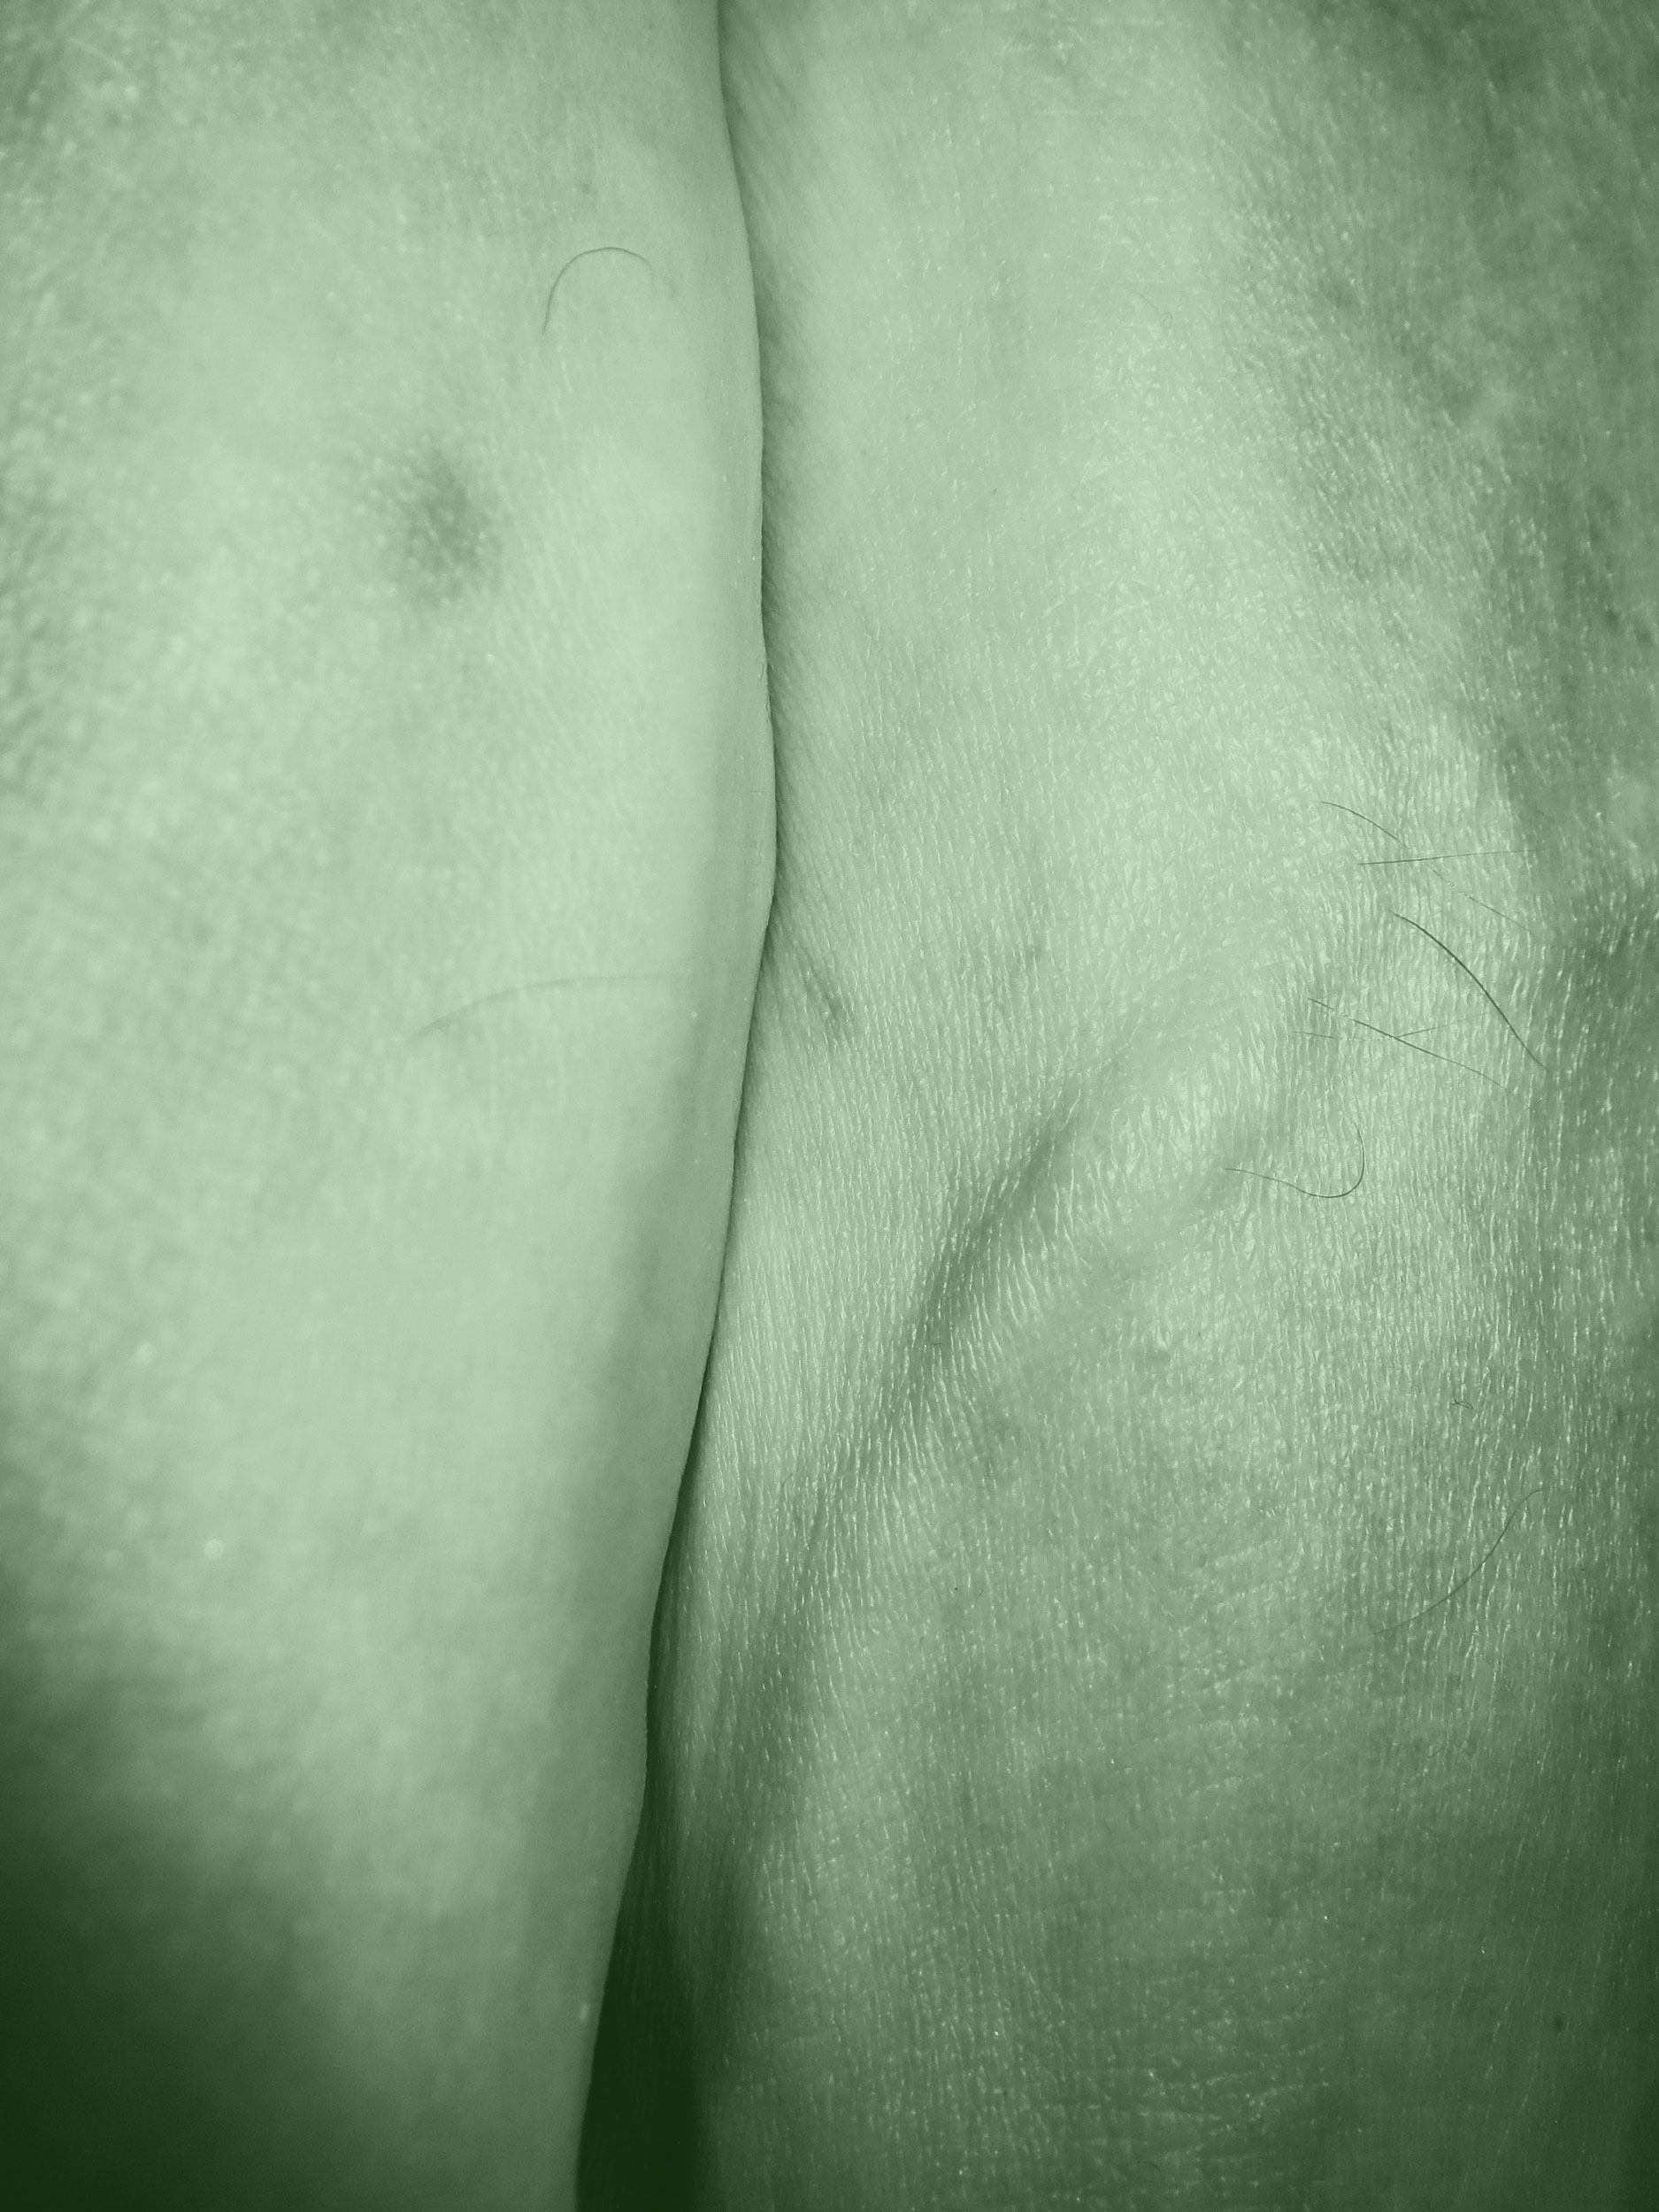 T-skin-11.jpg